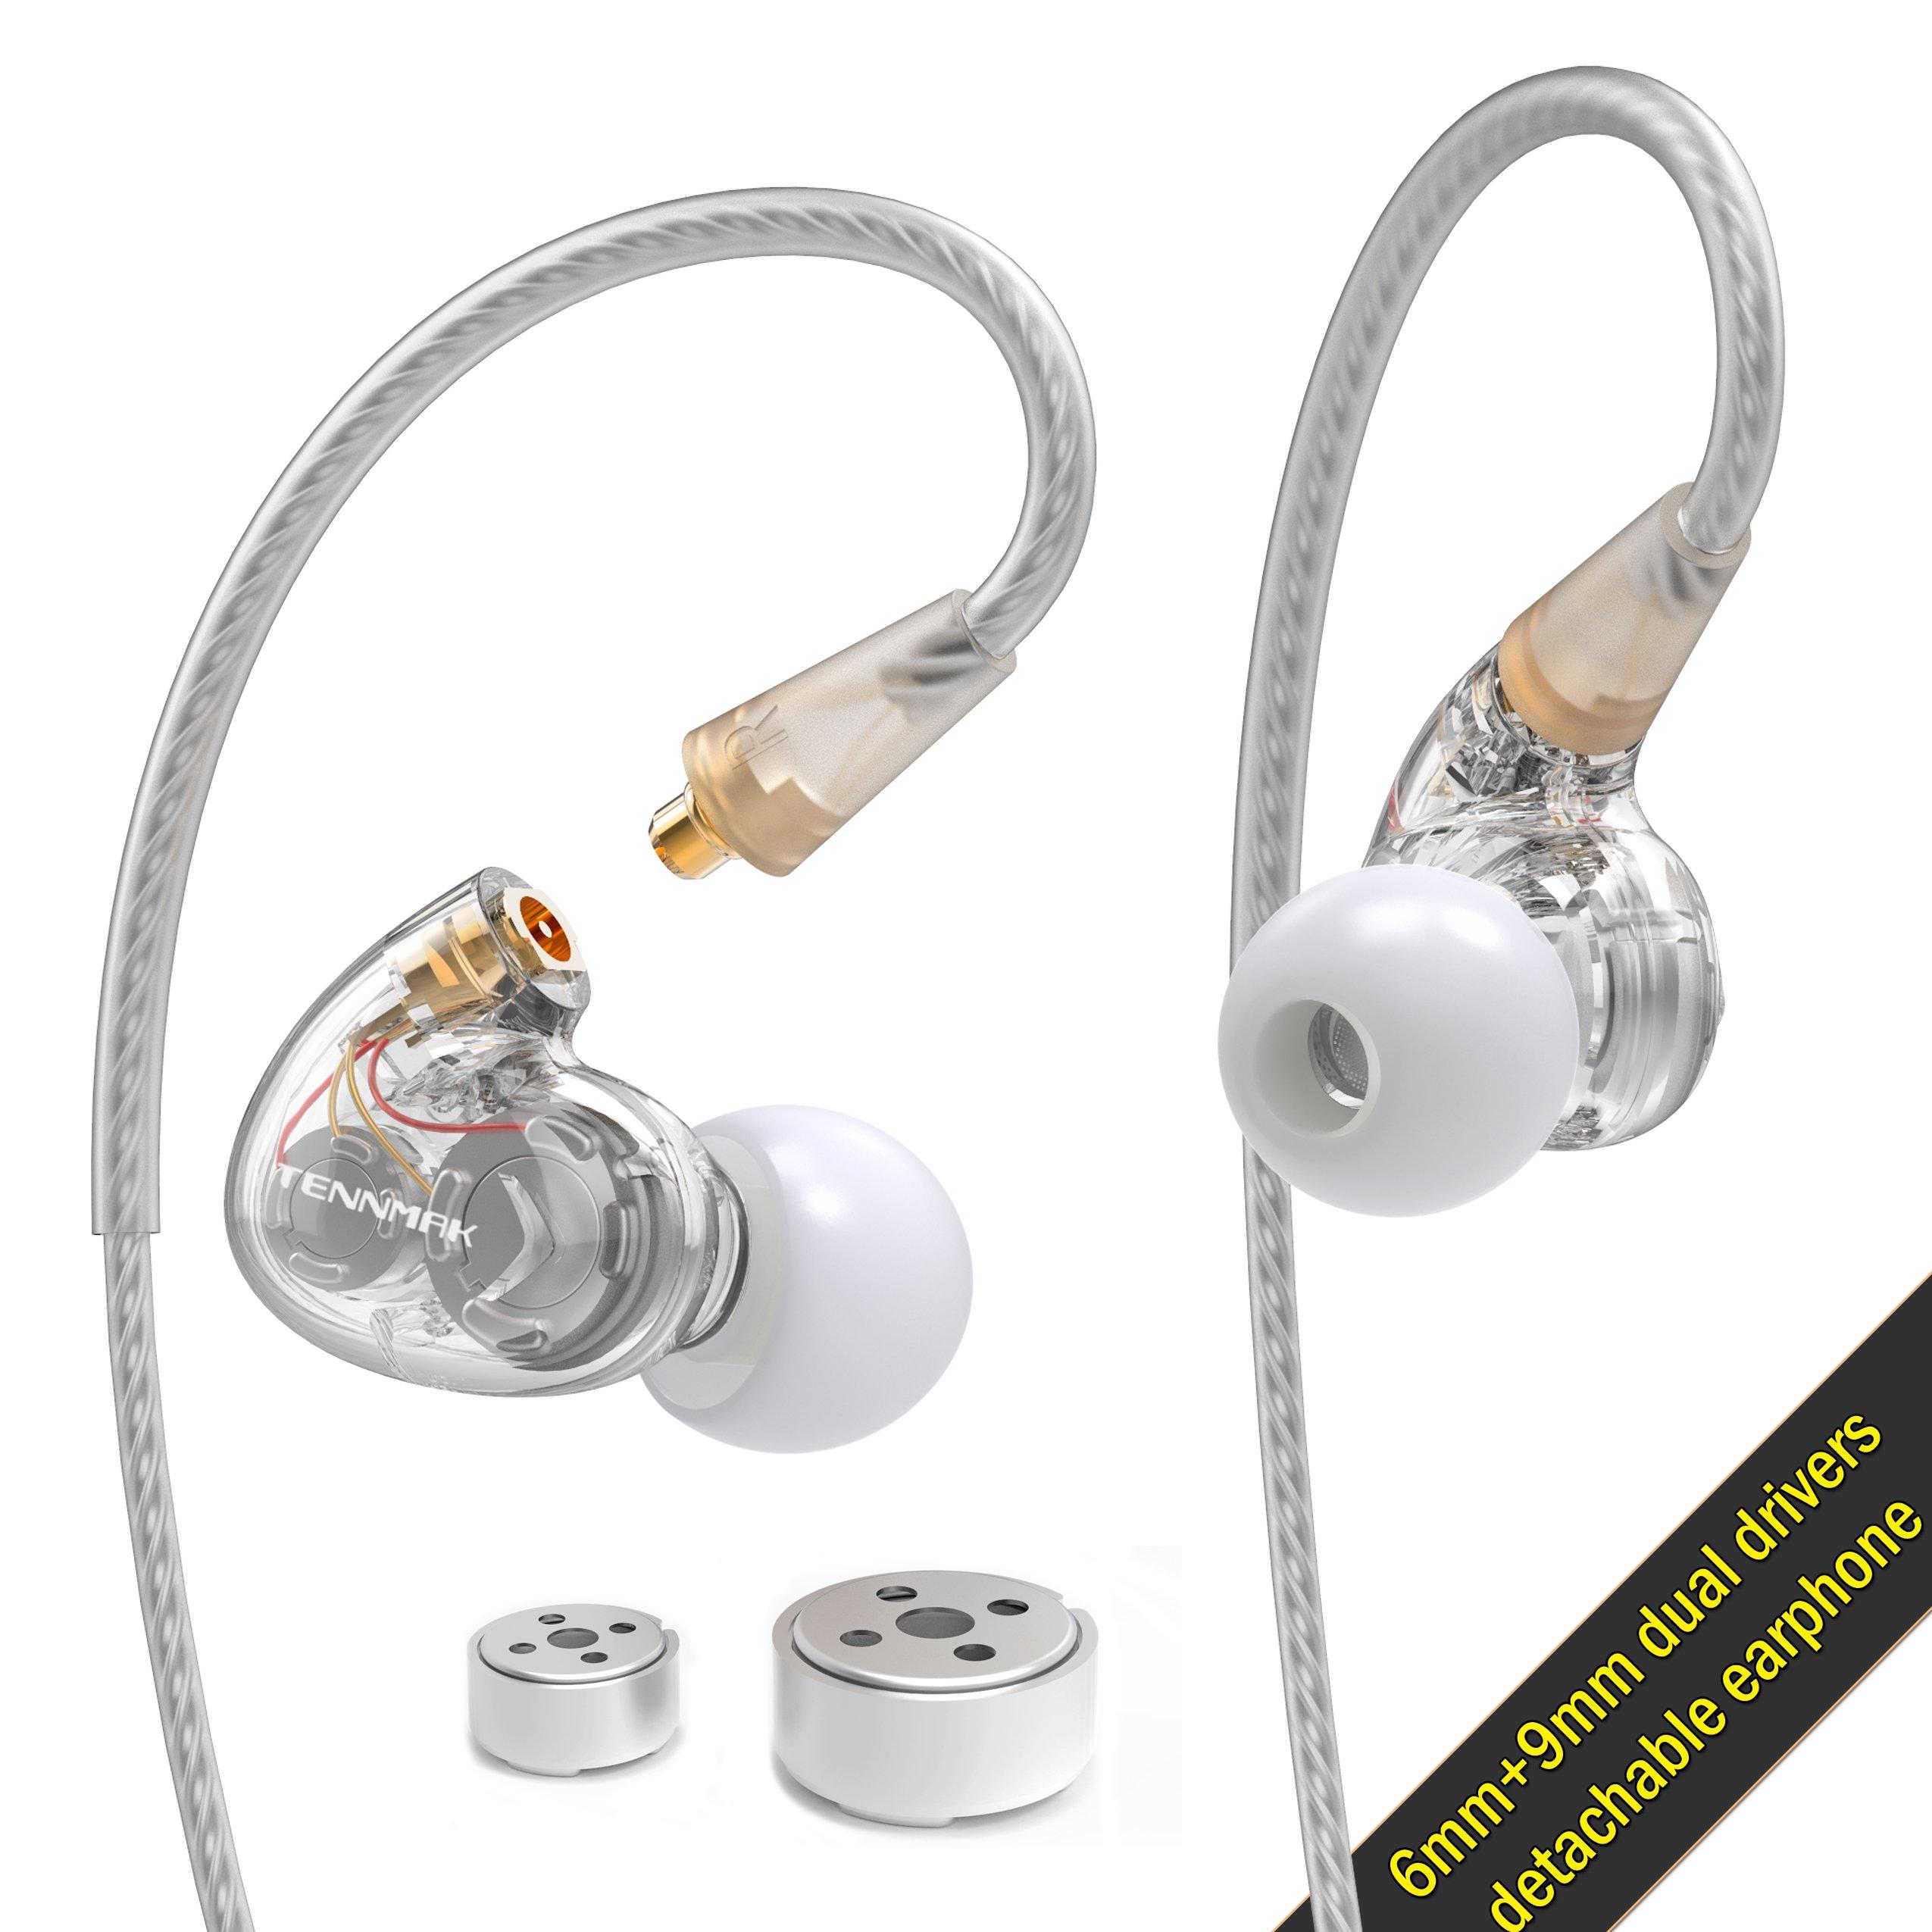 Auriculares Tennmak Pro Dual Dynamic Driver Professional Sport In Ear Detachable Earphone MMCX Earphone con 4 driver ins